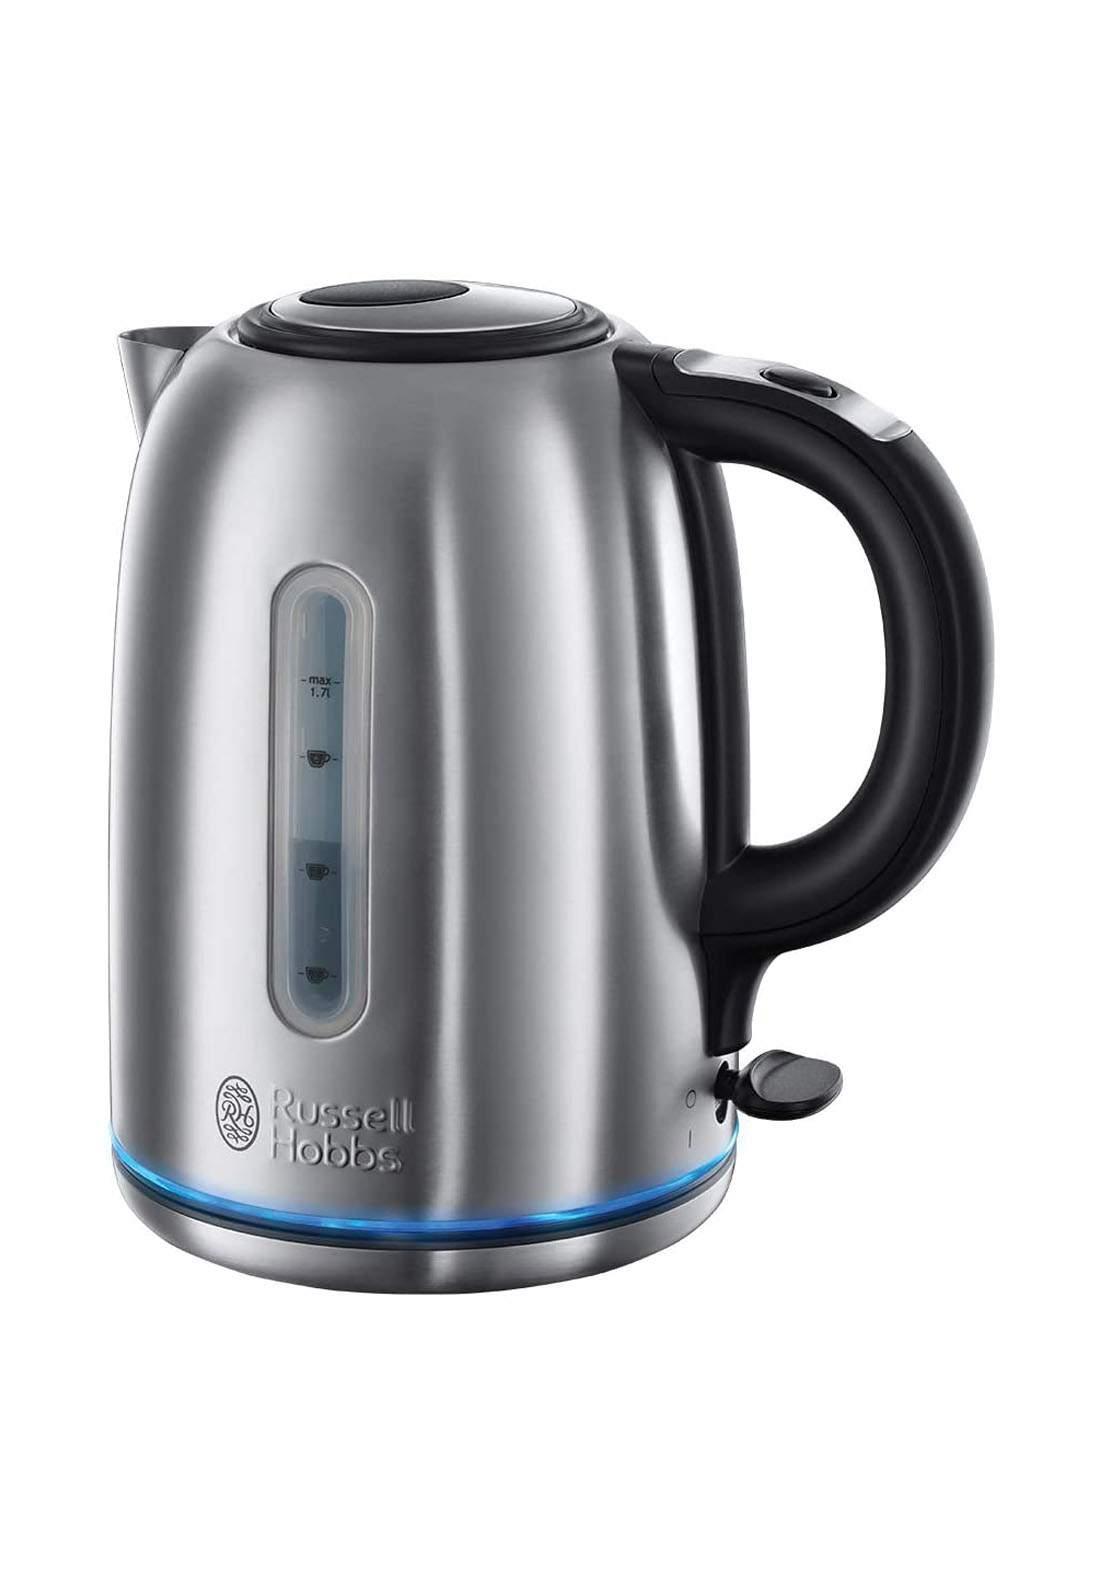 Russell hobbs 20460 Electrical kettle  غلاية